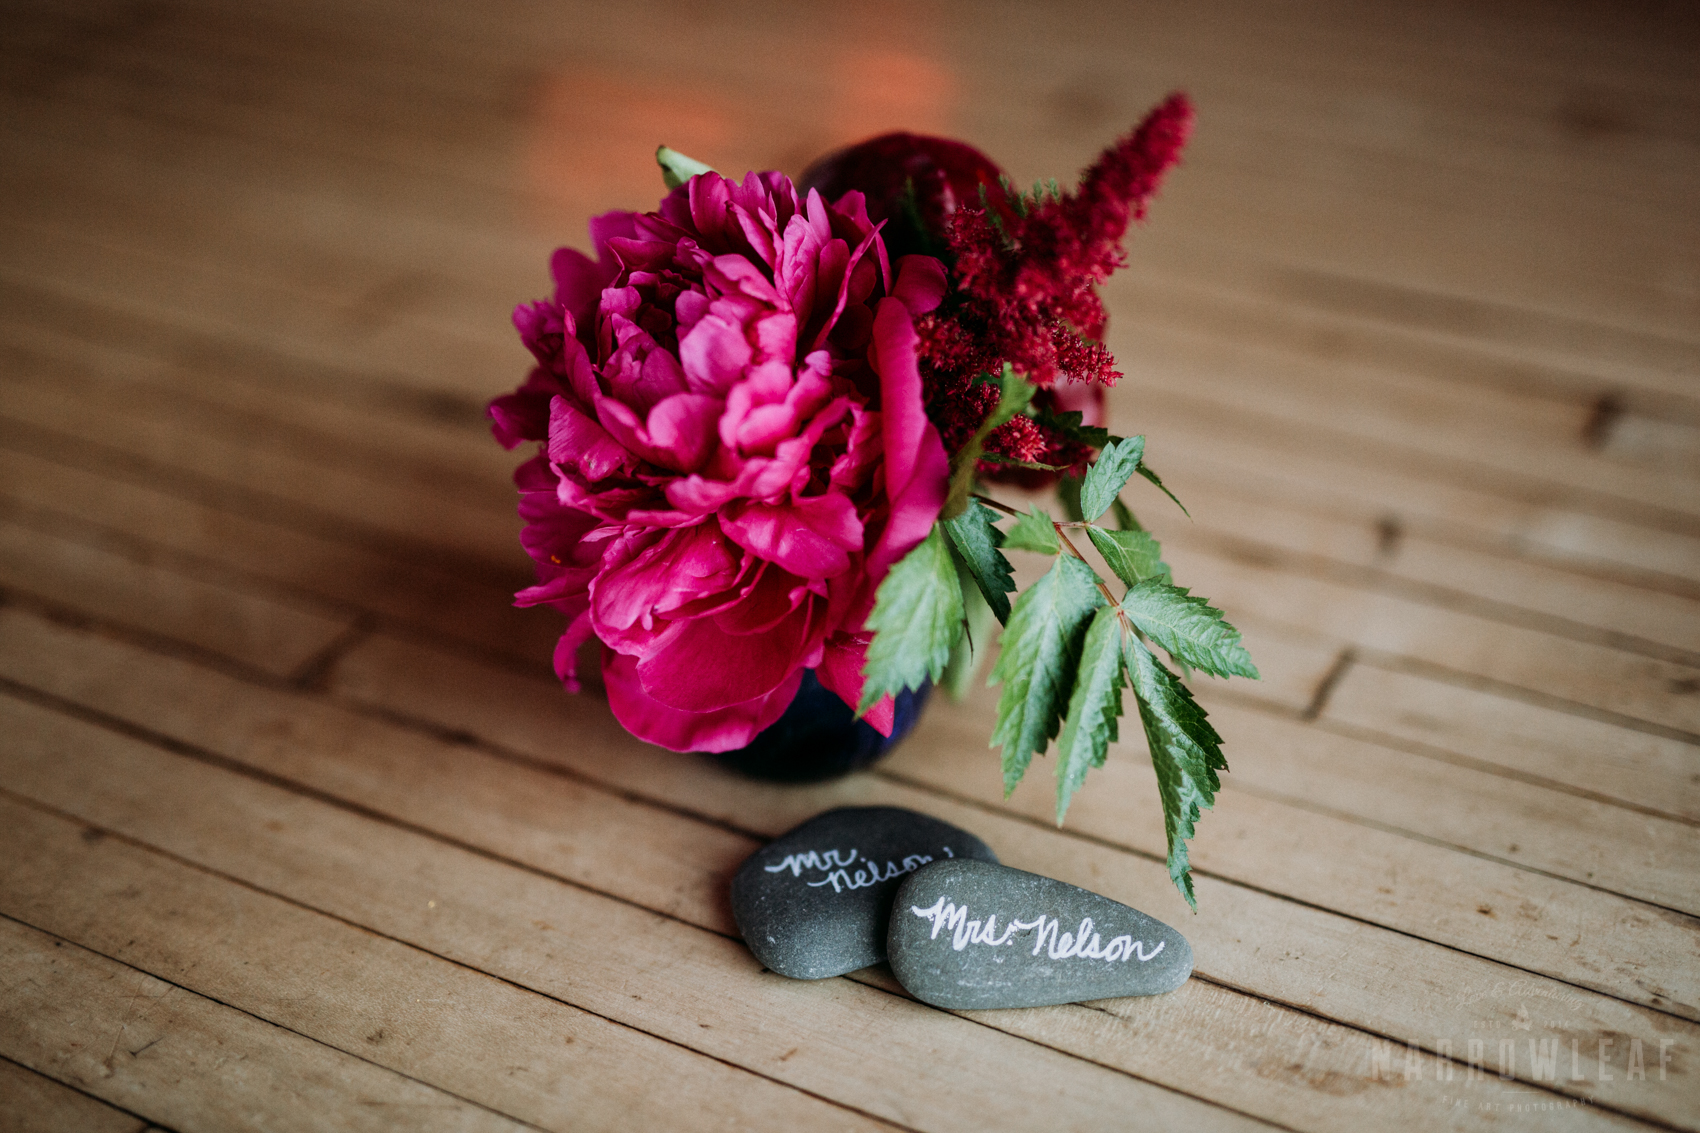 bayfield-wi-lake-superior-wedding-reception-floral-decorations-15.jpg